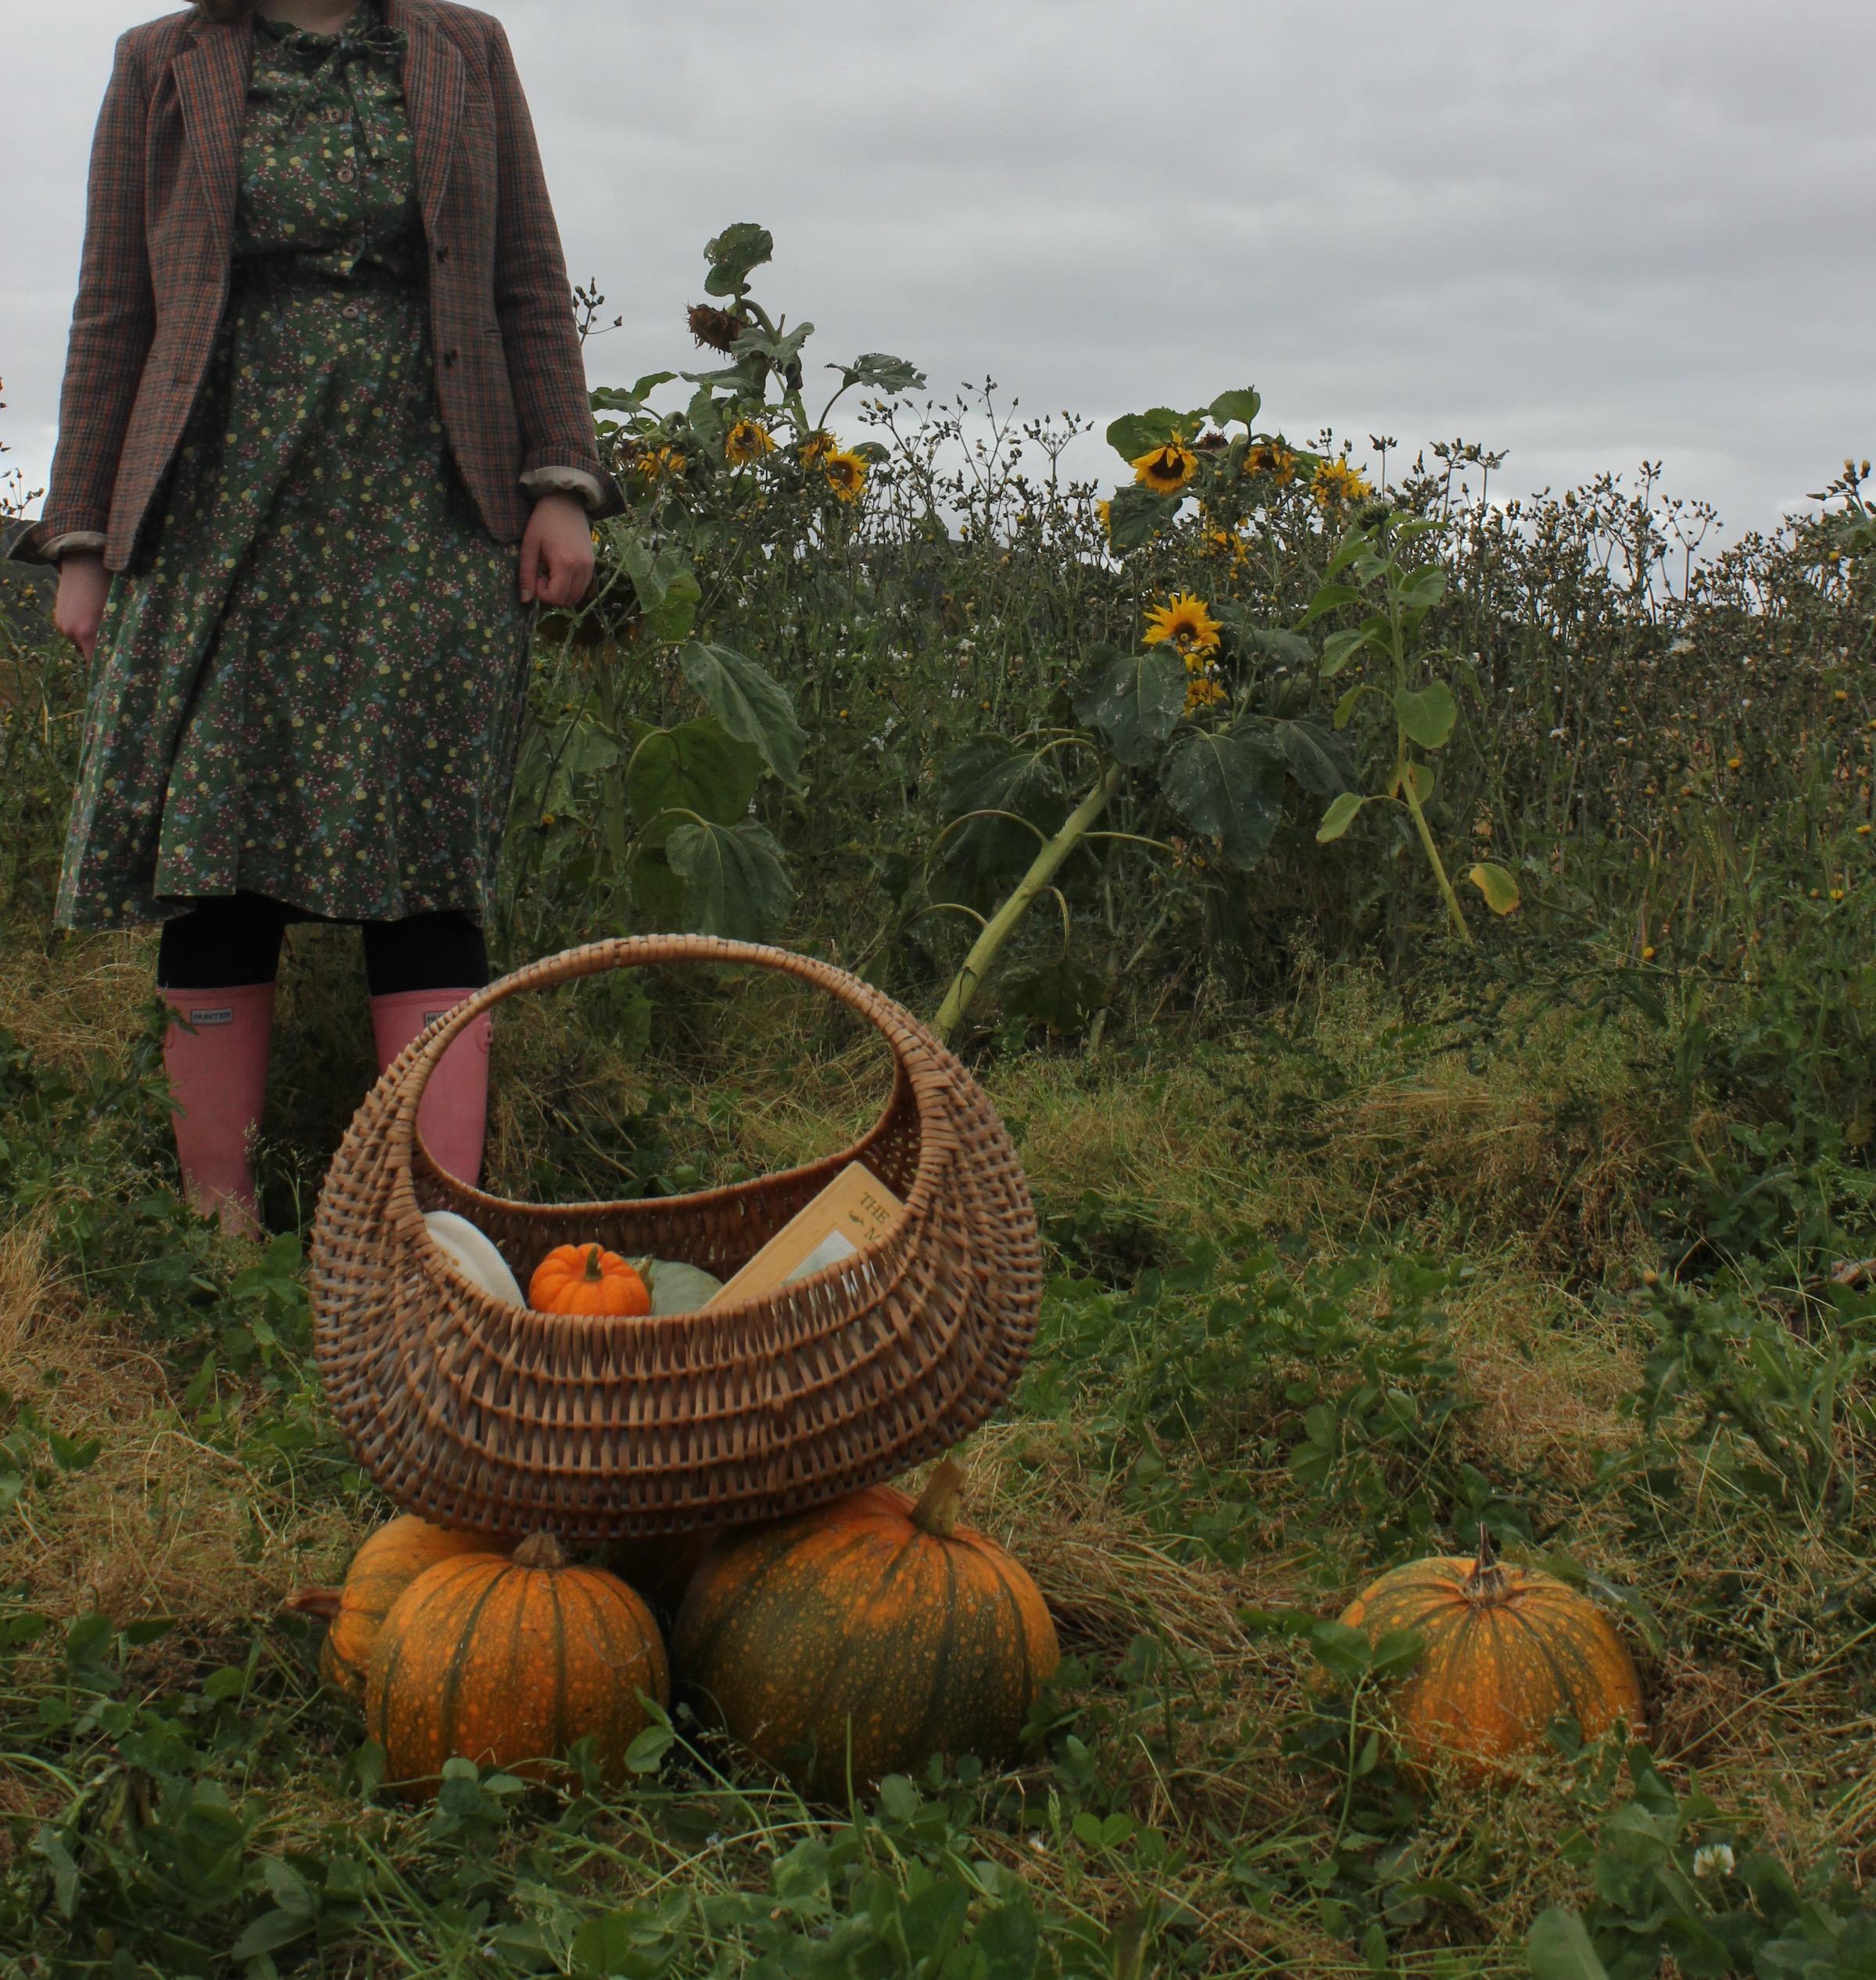 The Pumpkin Patch Kilduff Farm